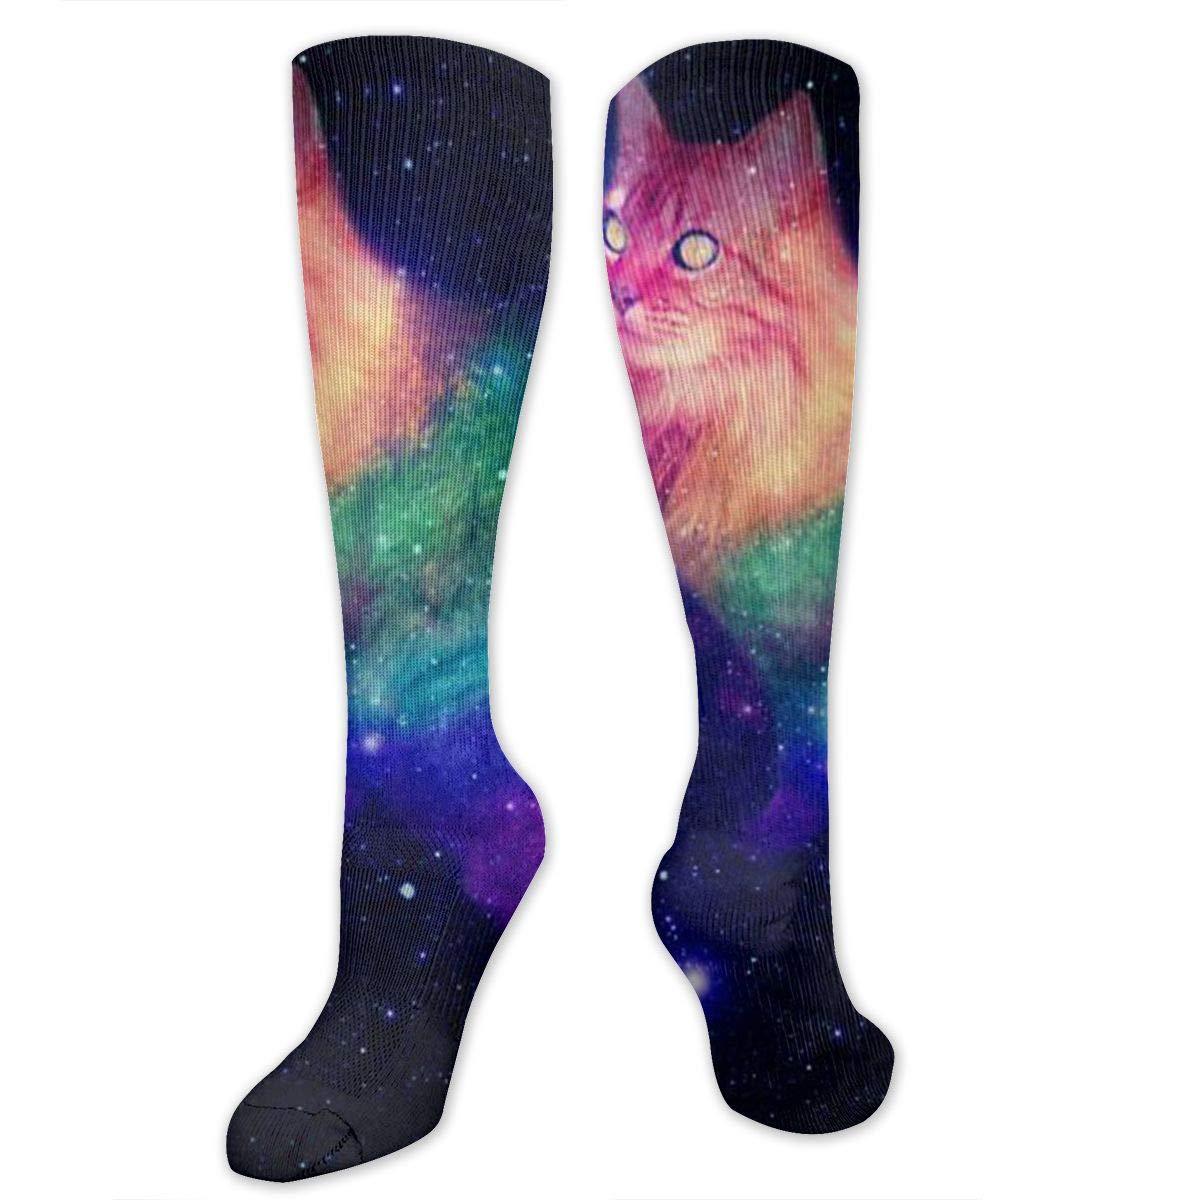 Men Multicolored Pattern Fashionable Fun Crew Cotton Socks Chanwazibibiliu Cat in Space Tumblr Galaxy Mens Colorful Dress Socks Funky